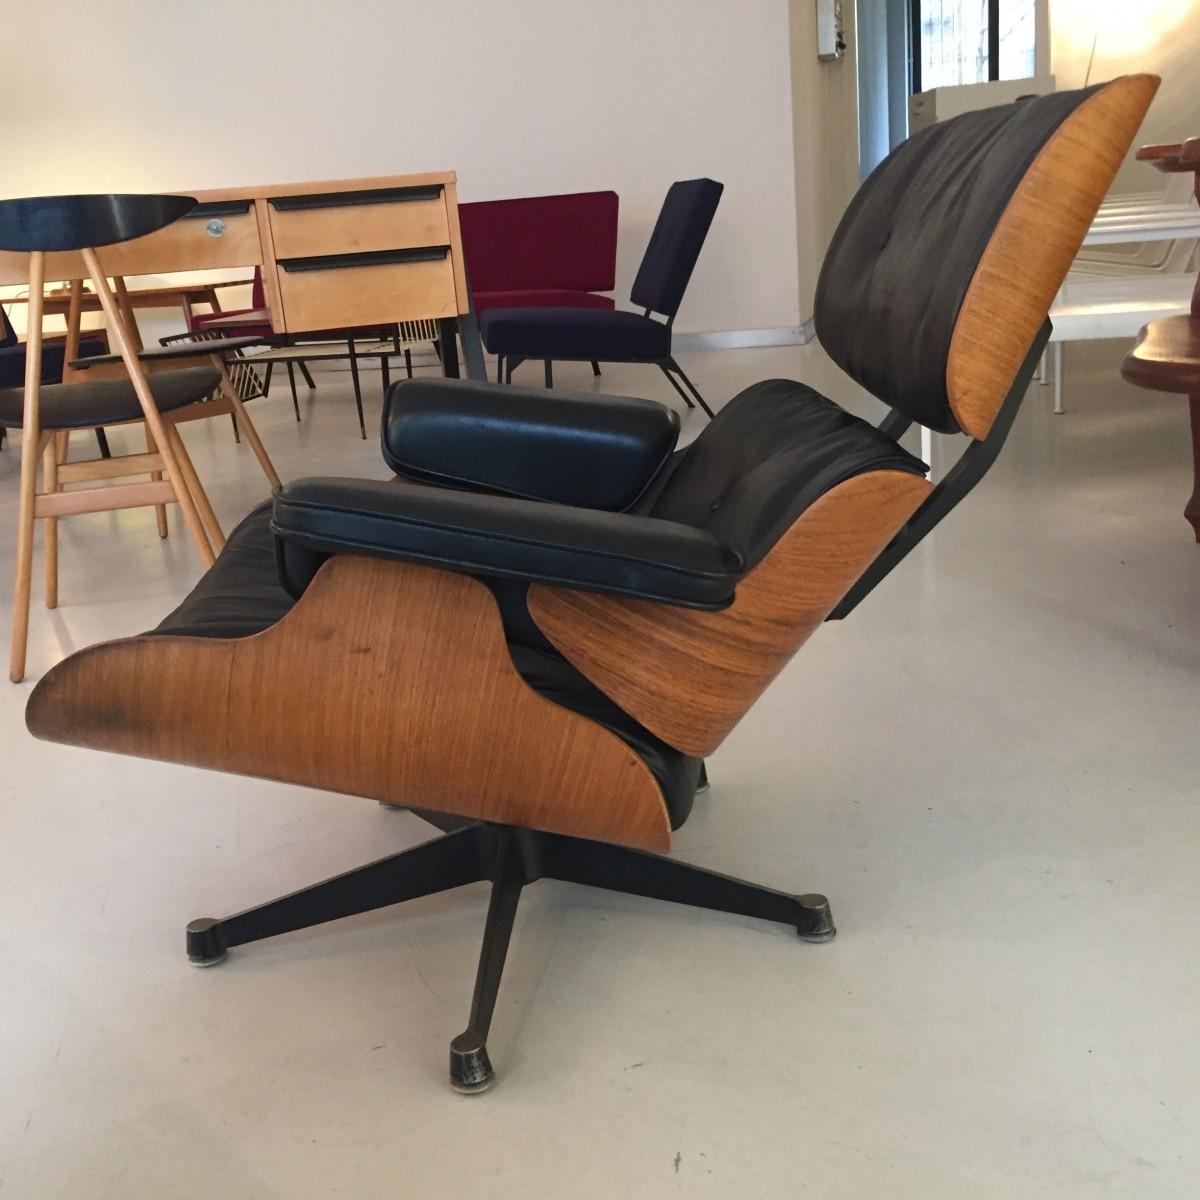 Eames Lounge Chair In Palisander Elastique Zürich Vintage Möbel